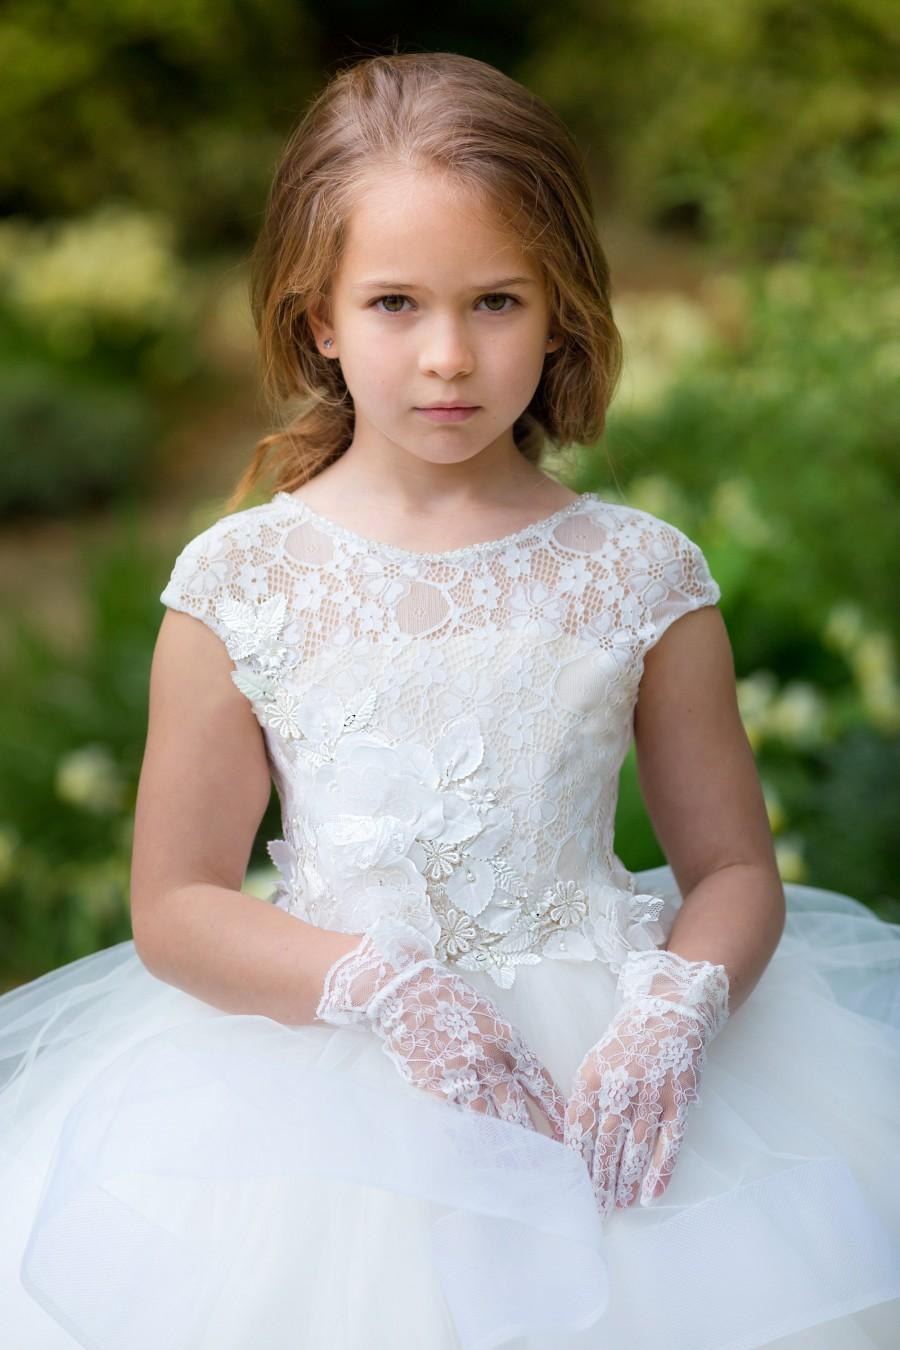 Wedding - First Communion Baptism Ivory flower girl dress Princess Birthday toddler baby